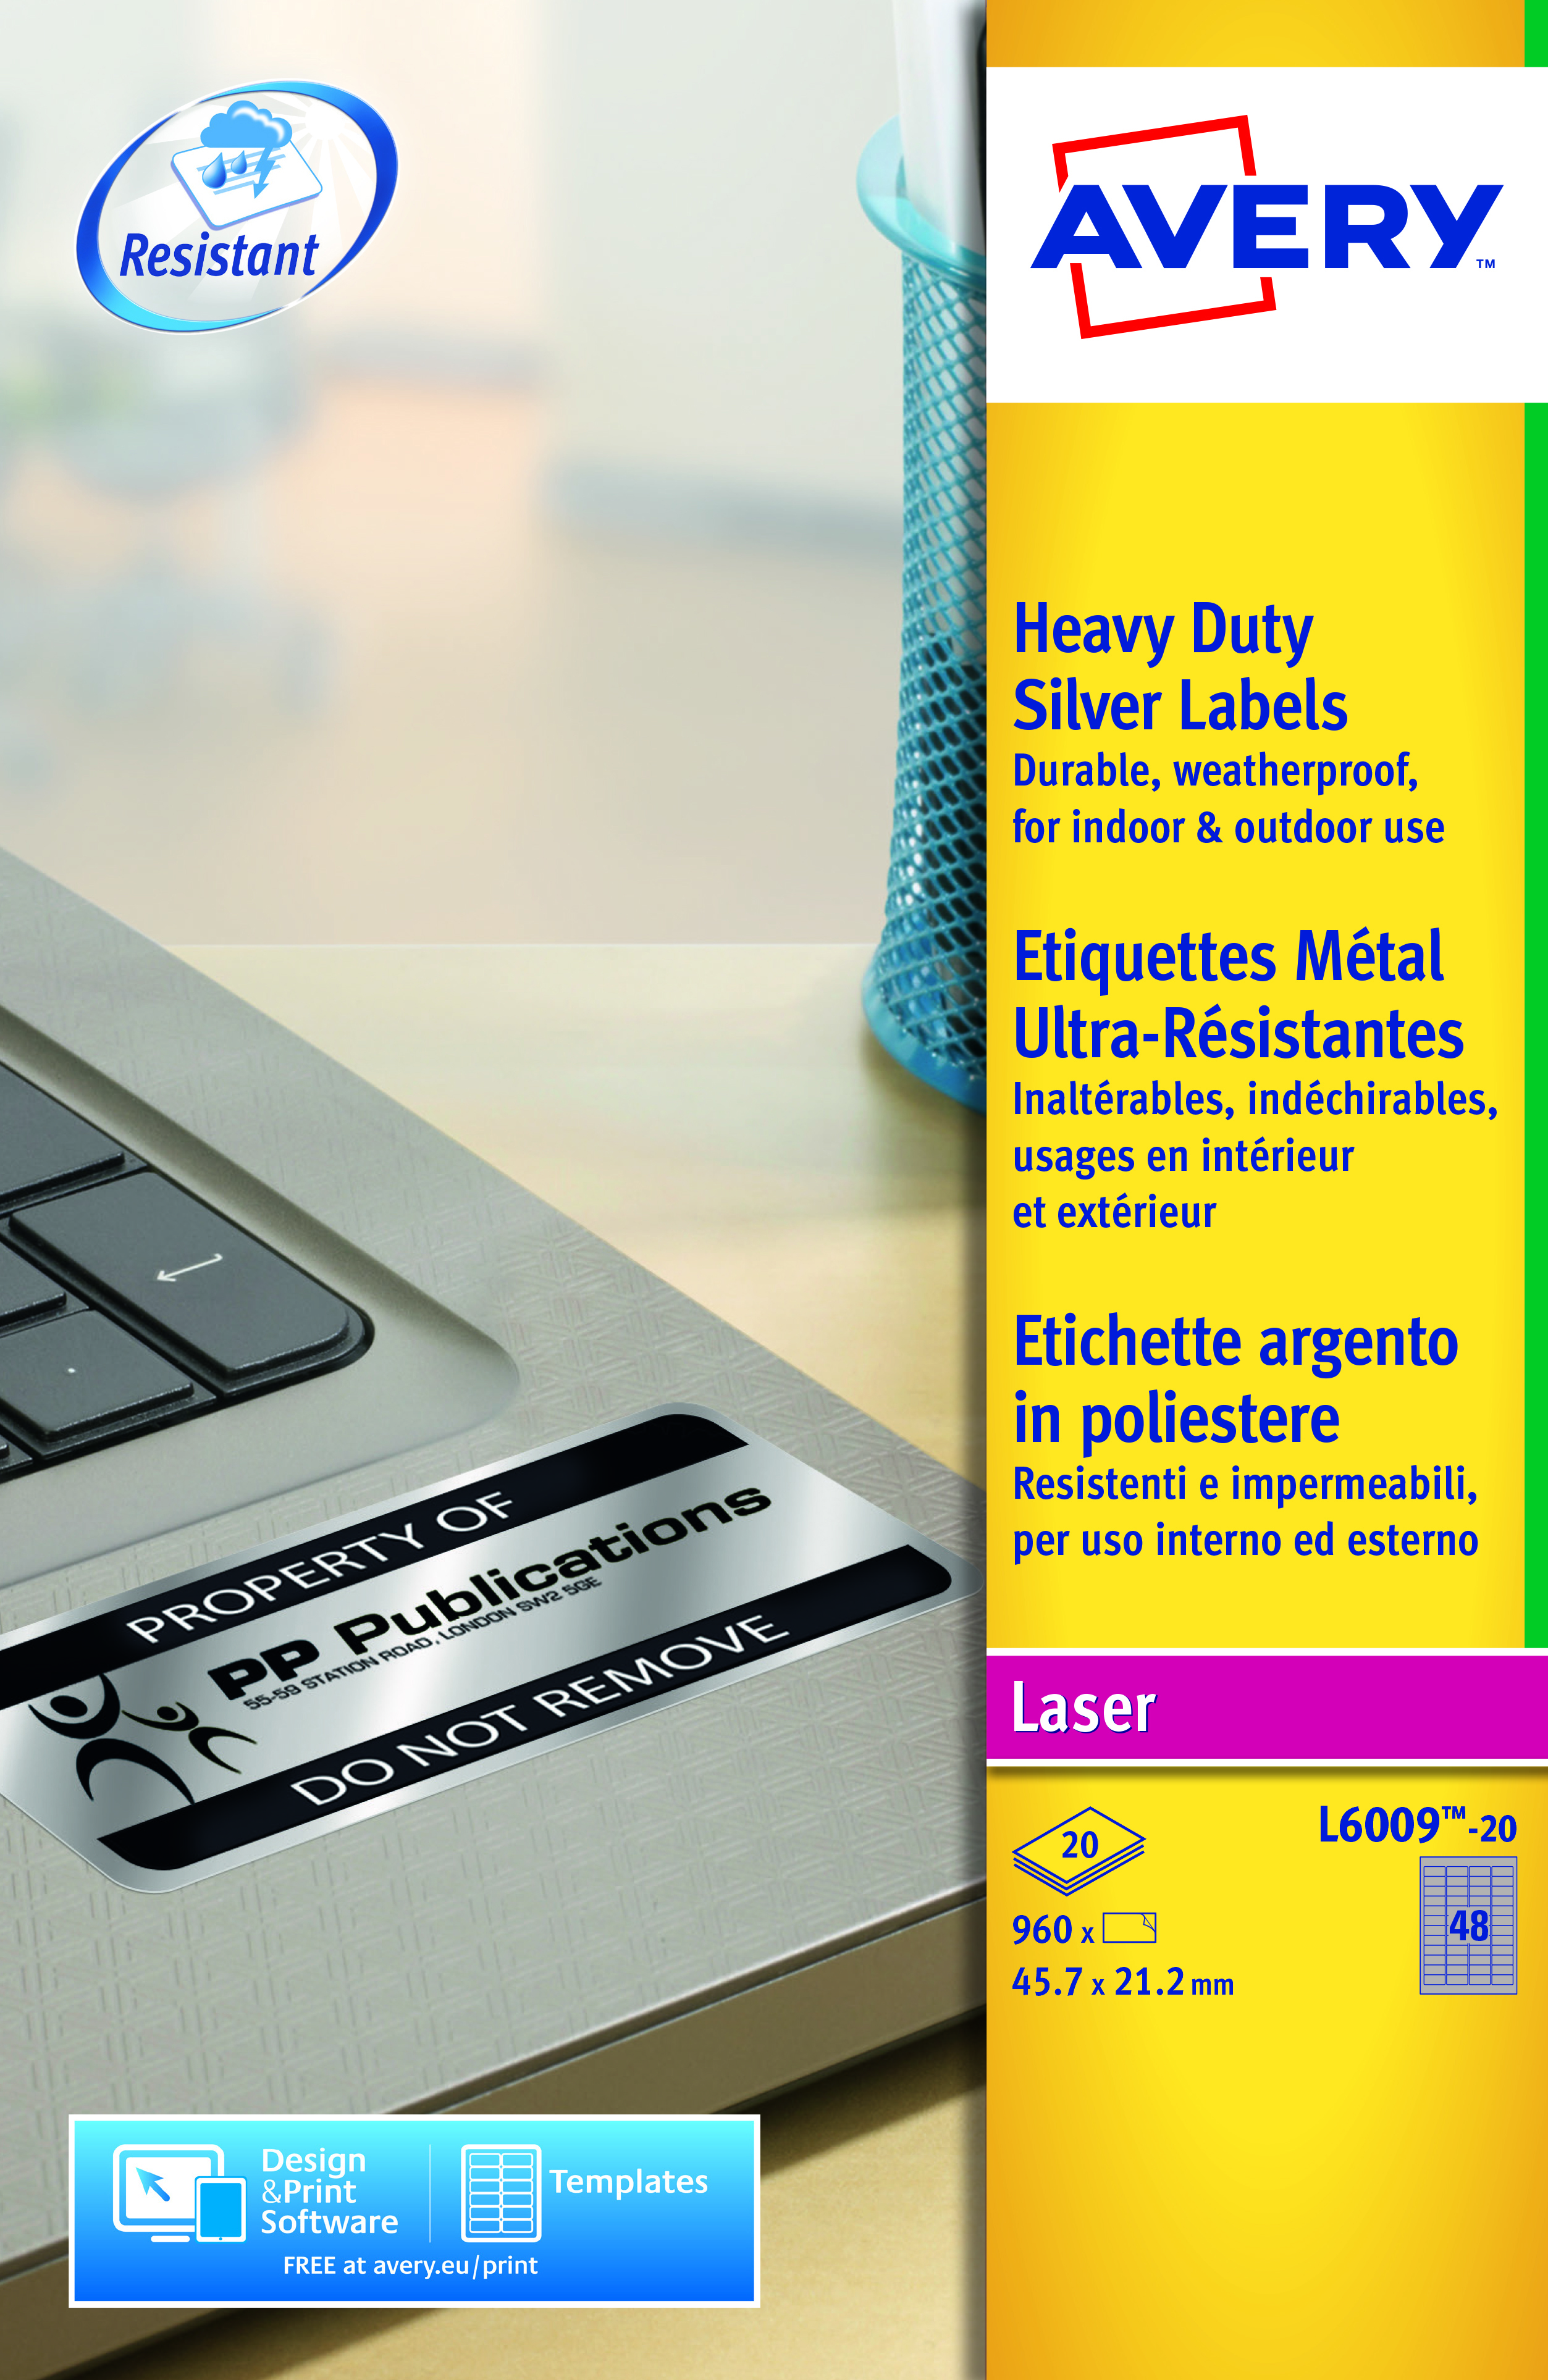 Avery HD Label 45.7x21.2mm SL PK960